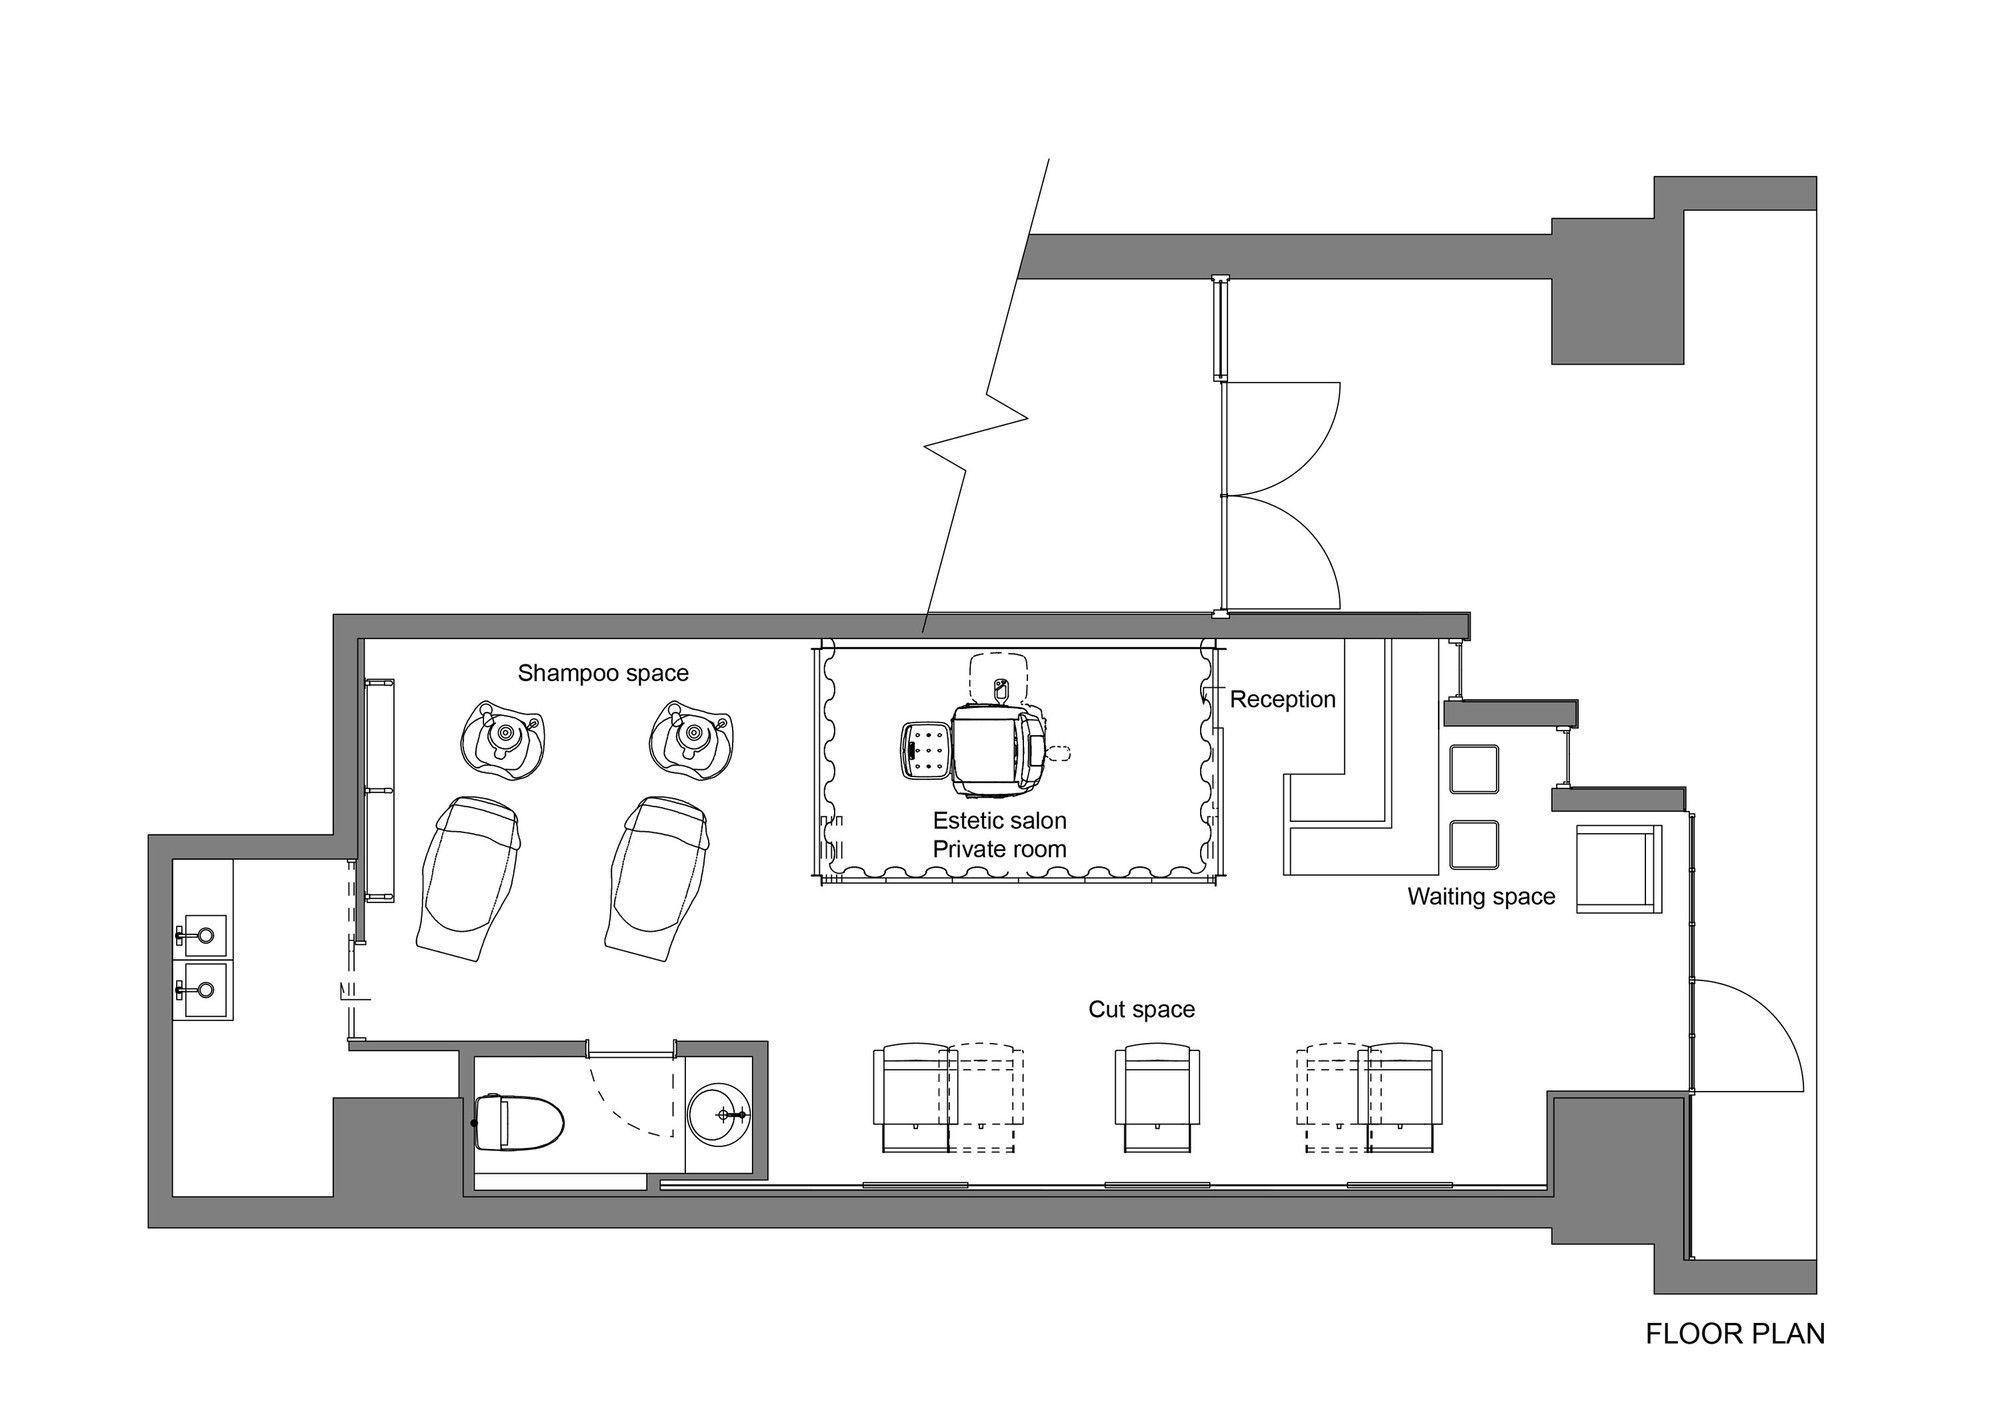 Spa Floor Plan Design  Beauty salon design, Floor plans, Hair